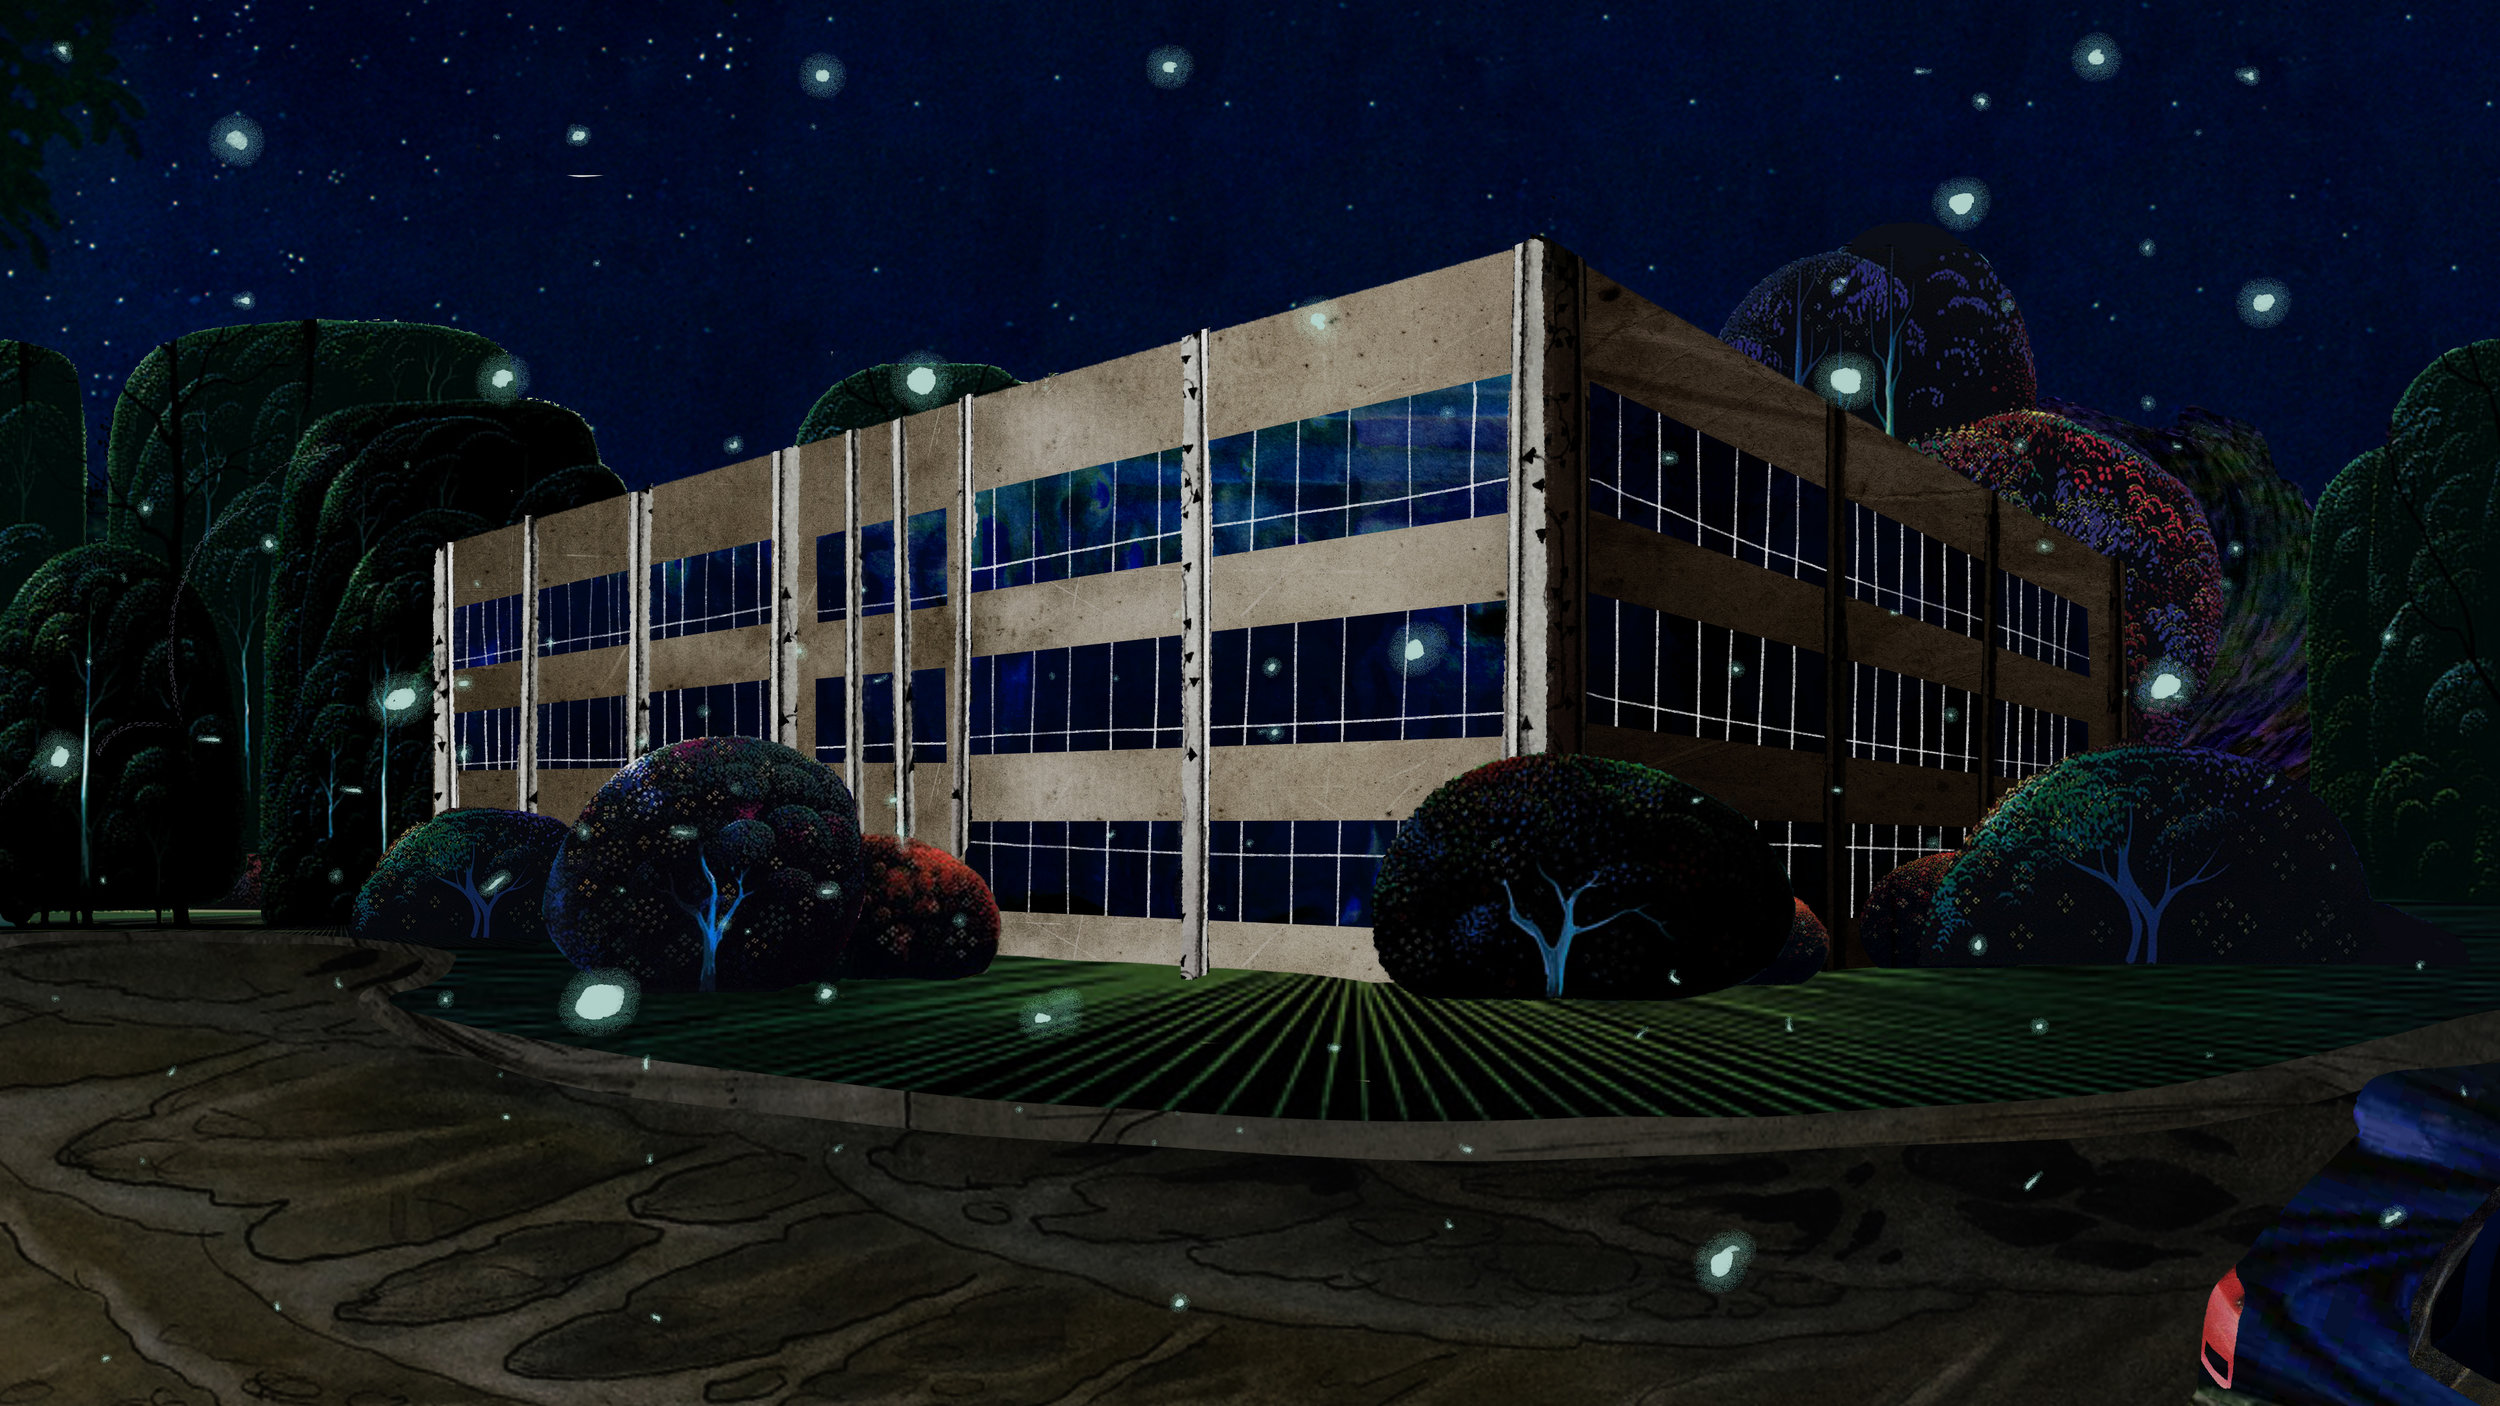 STYLEFRAME_Office_Building_Night_V001